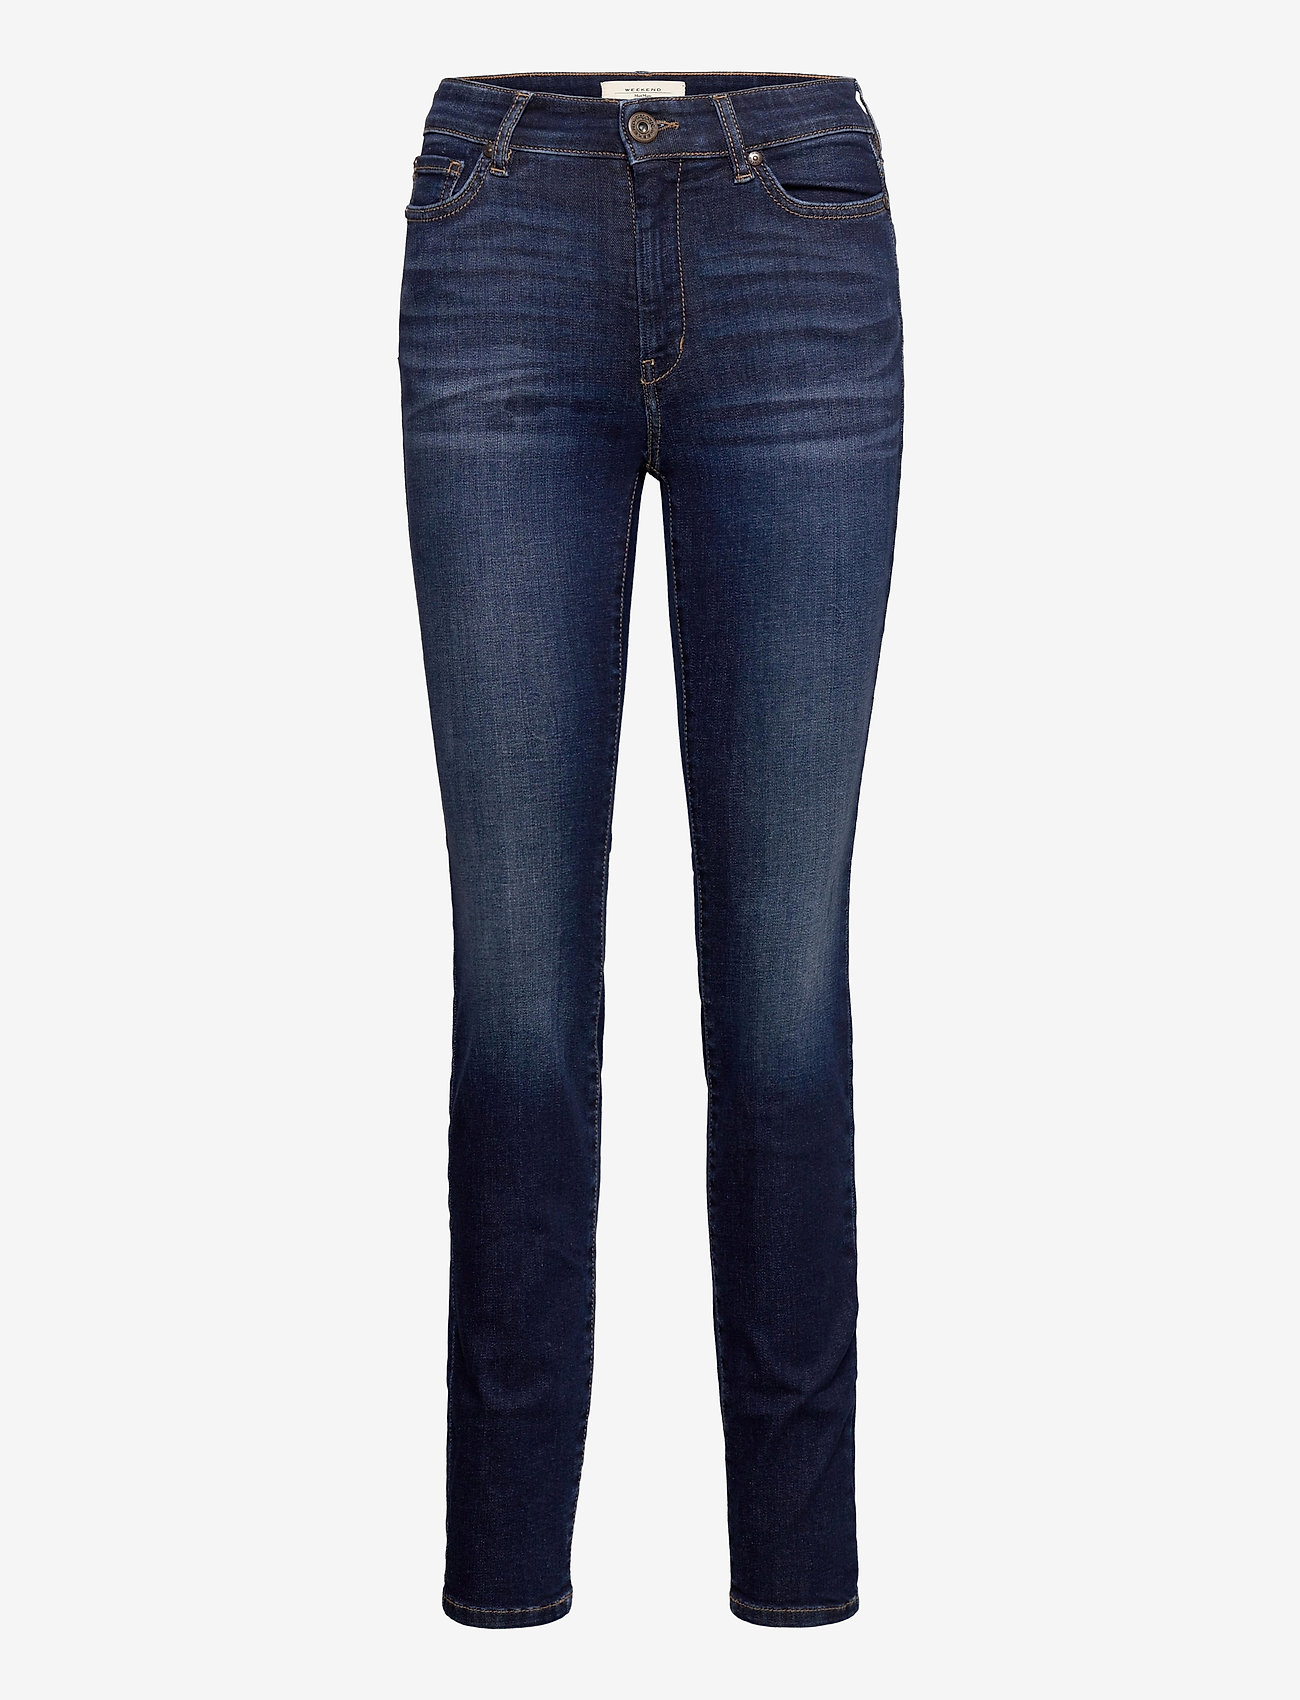 Weekend Max Mara - PATTO - slim jeans - midnightblue - 0